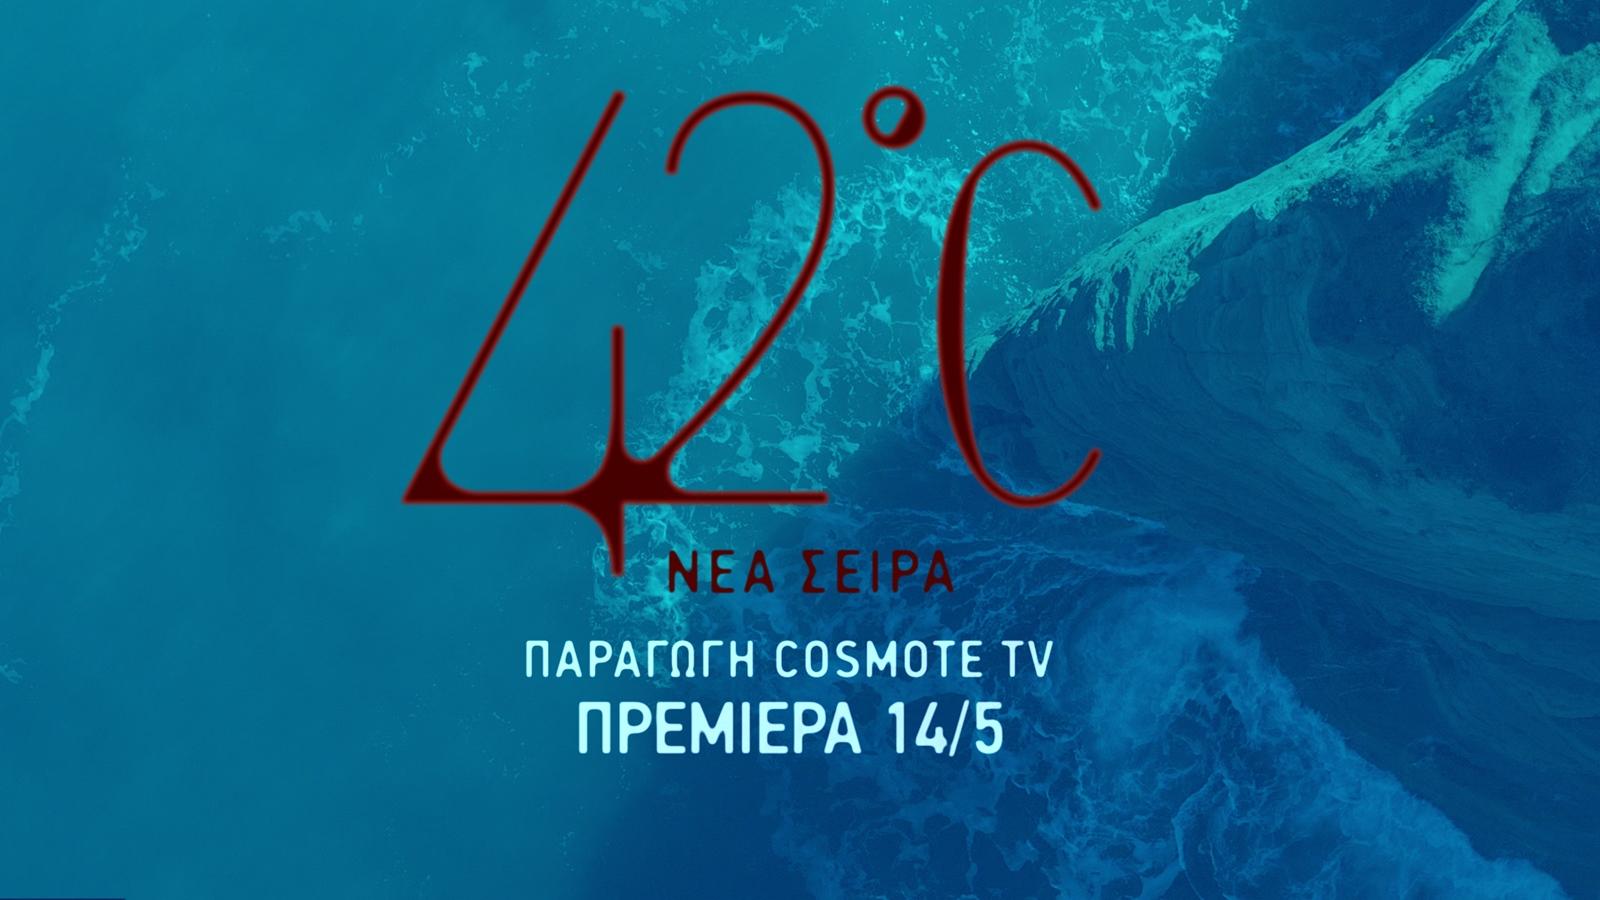 «42°C»: Πρεμιέρα για τη νέα σειρά παραγωγής COSMOTE TV